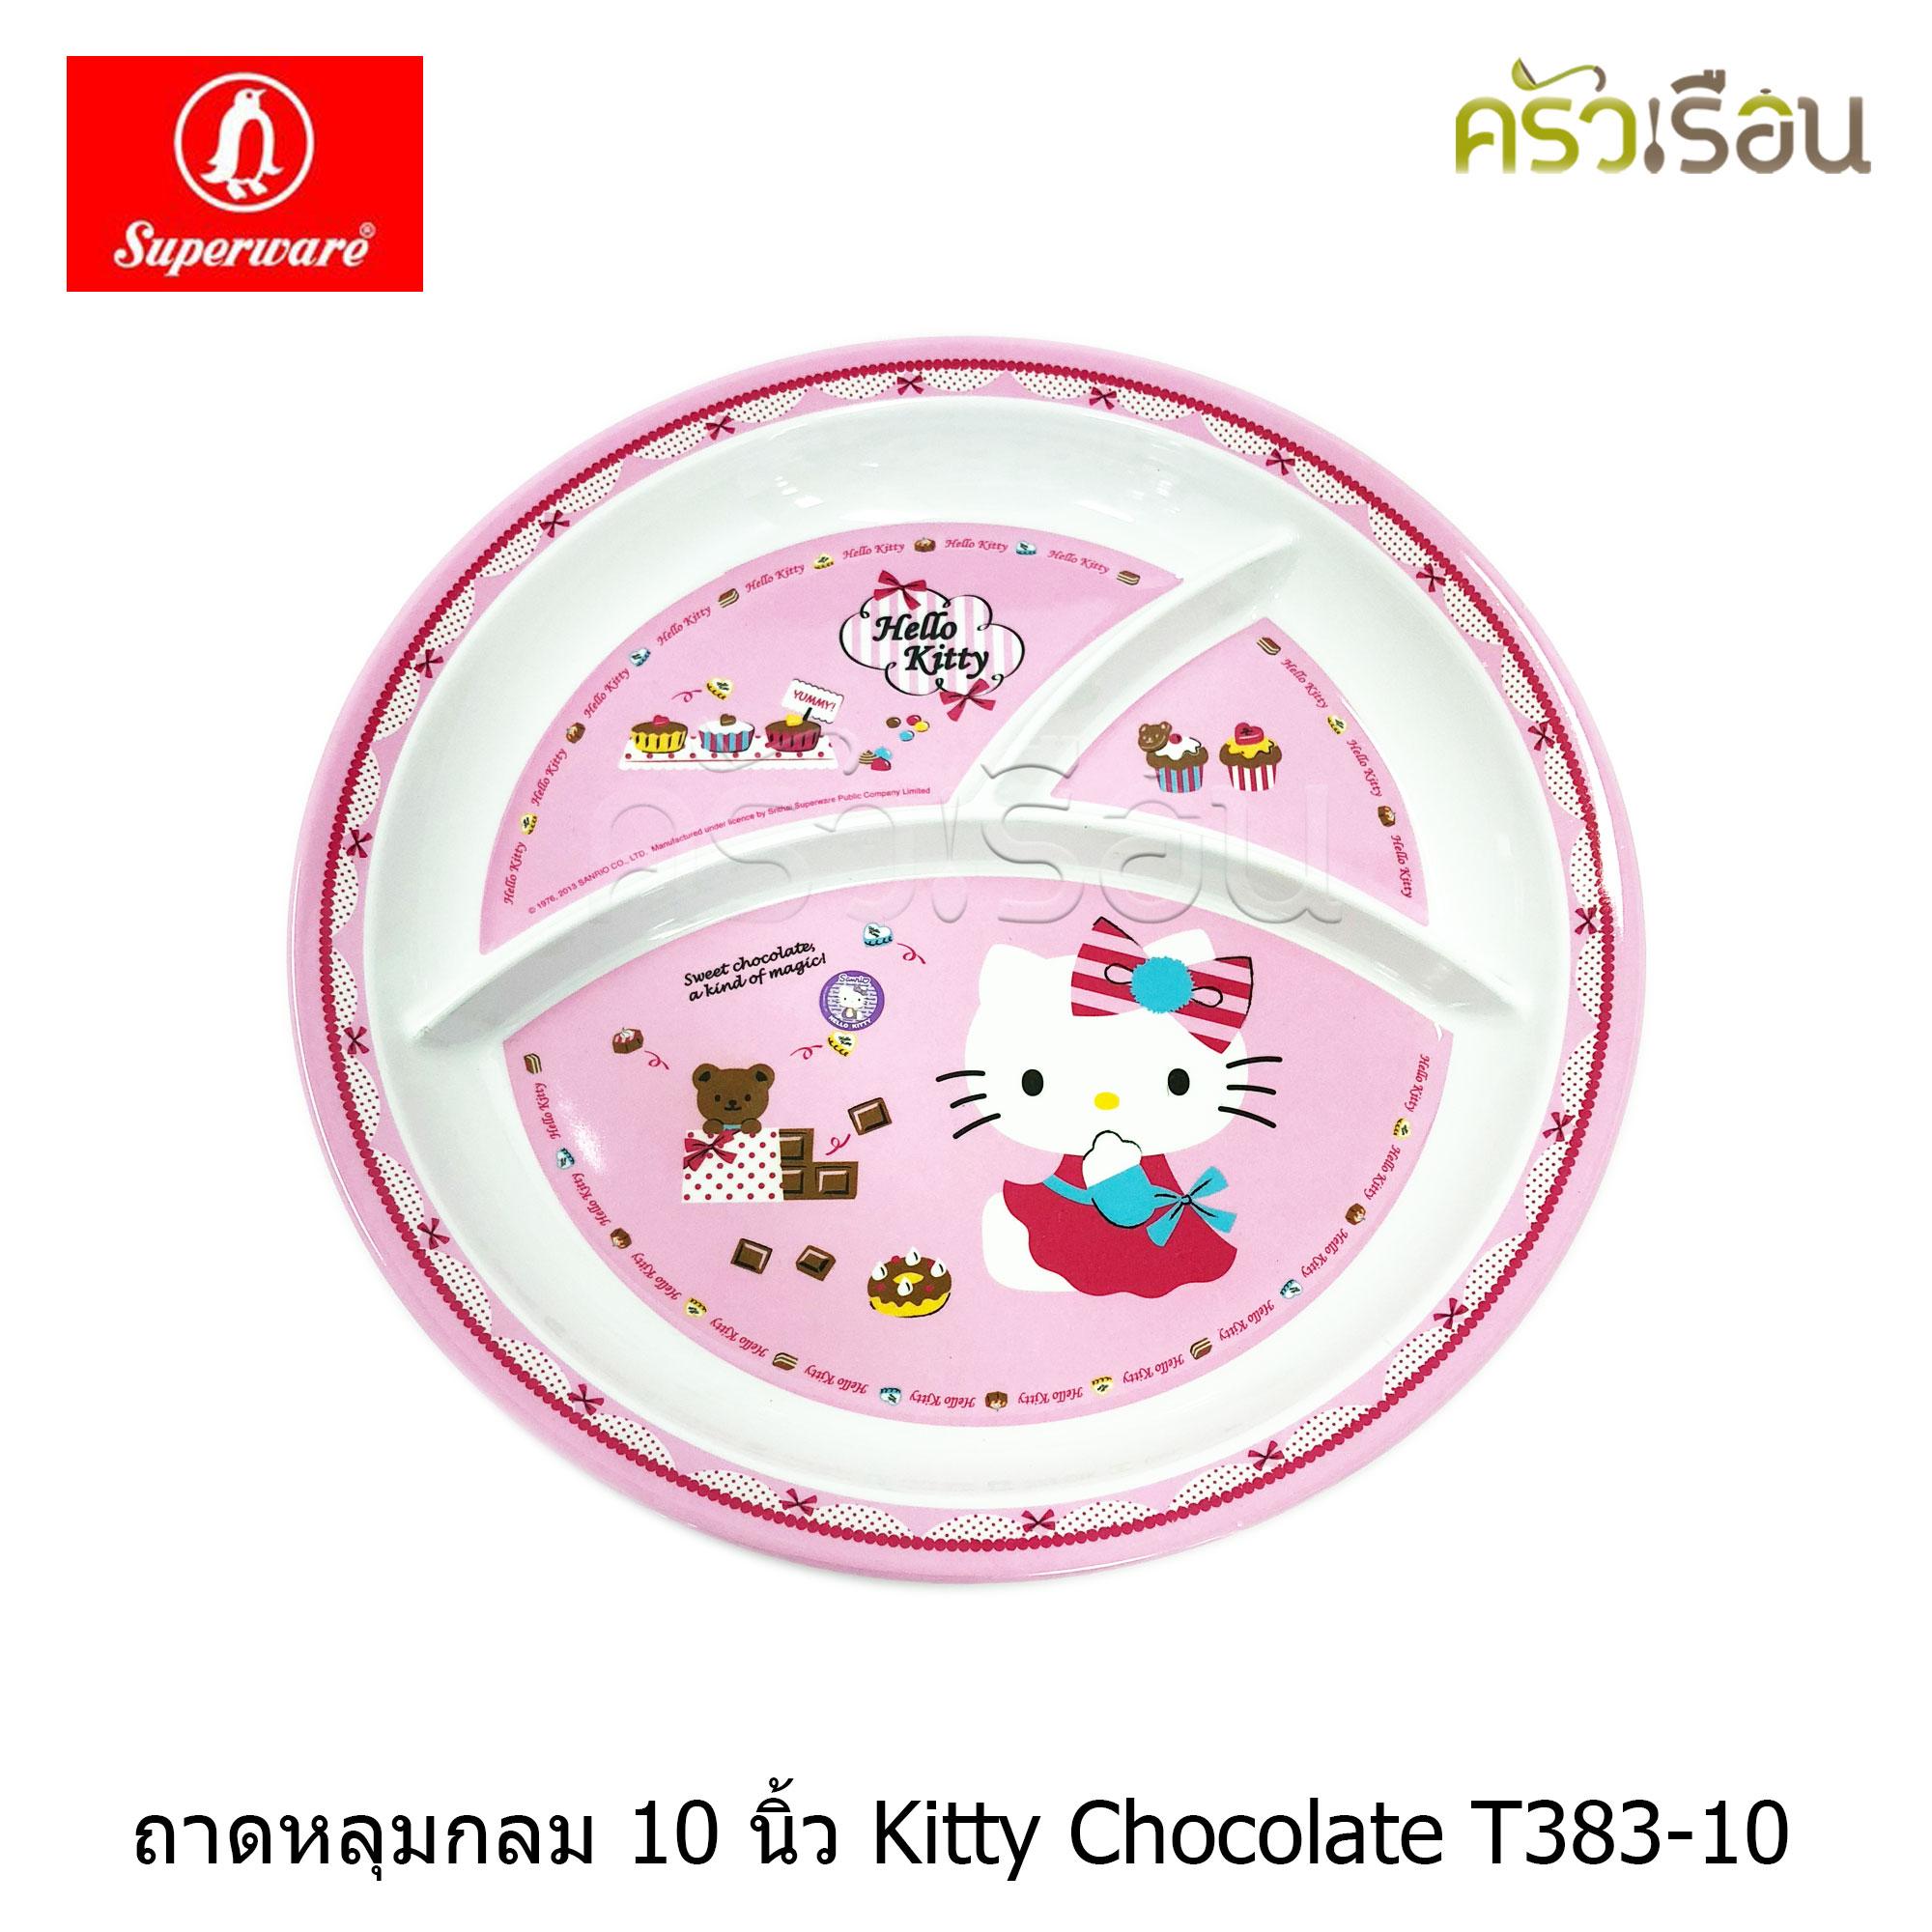 Superware ถาดหลุมกลม Kitty Chocolate 10 นิ้ว T383-10